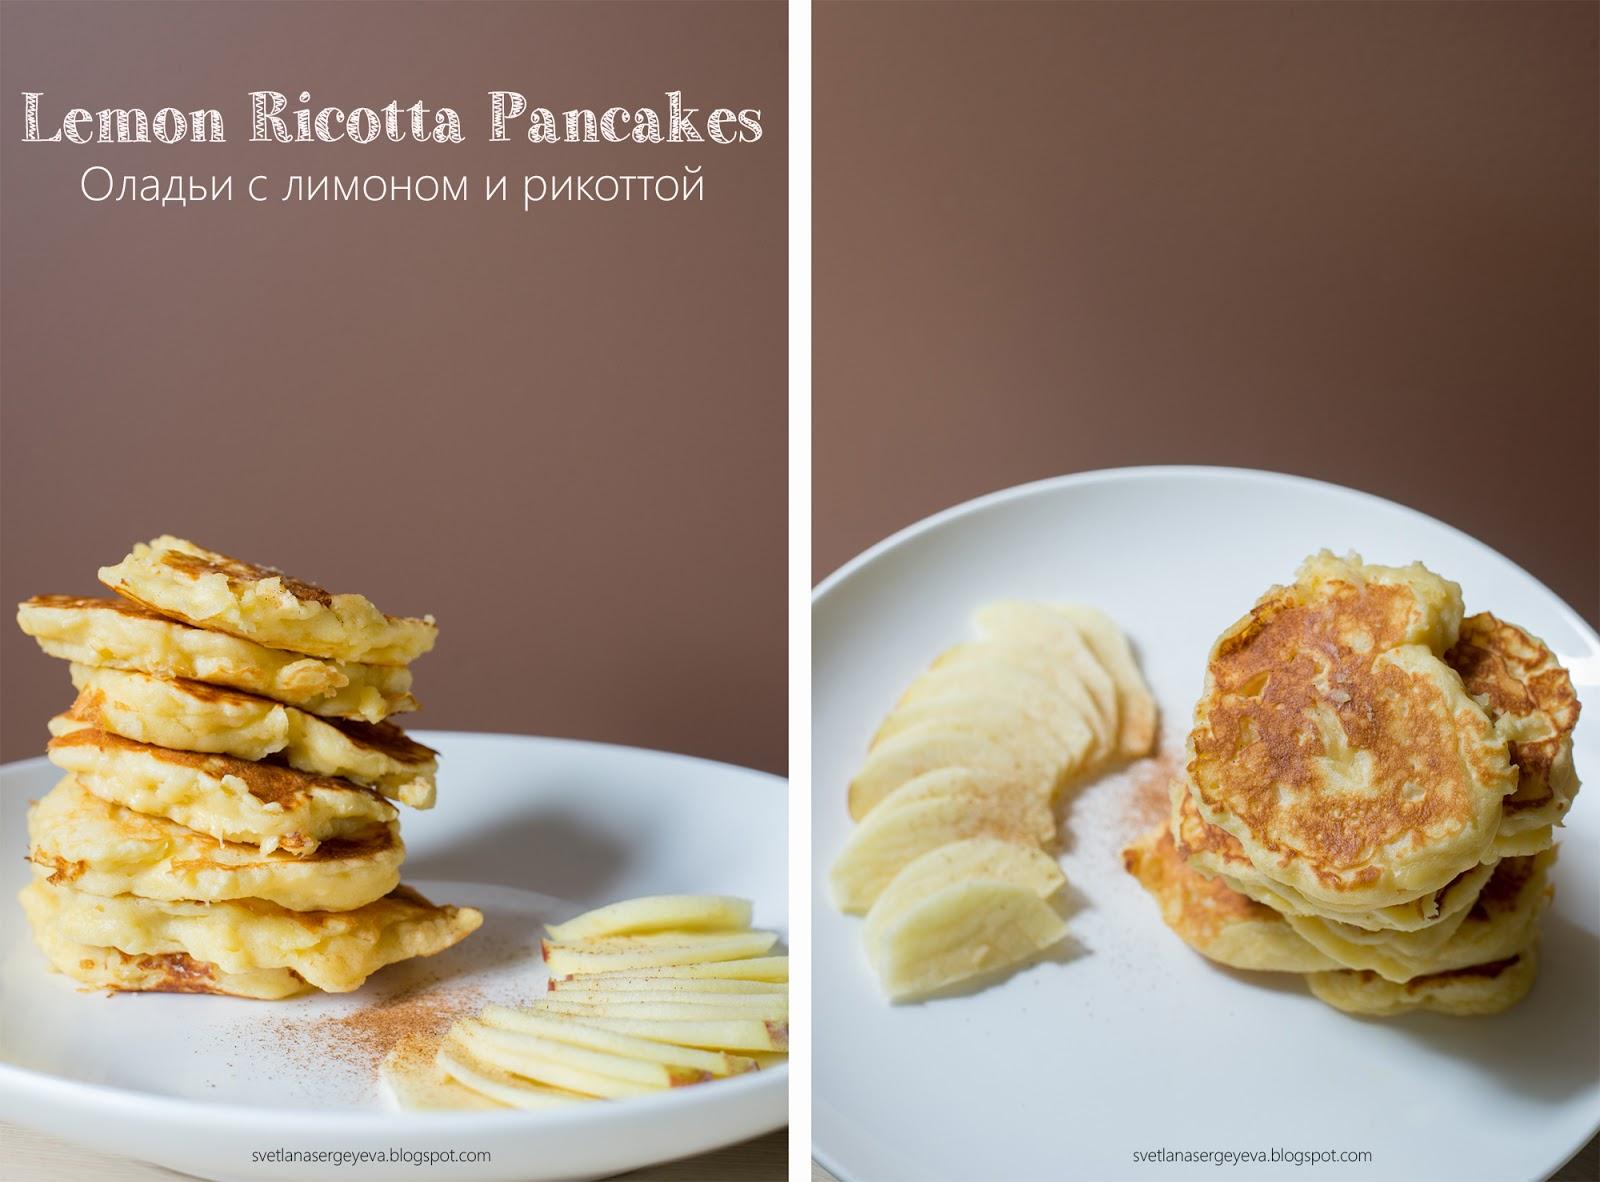 Lemon Ricotta Pancakes - Оладьи с лимоном и рикоттой